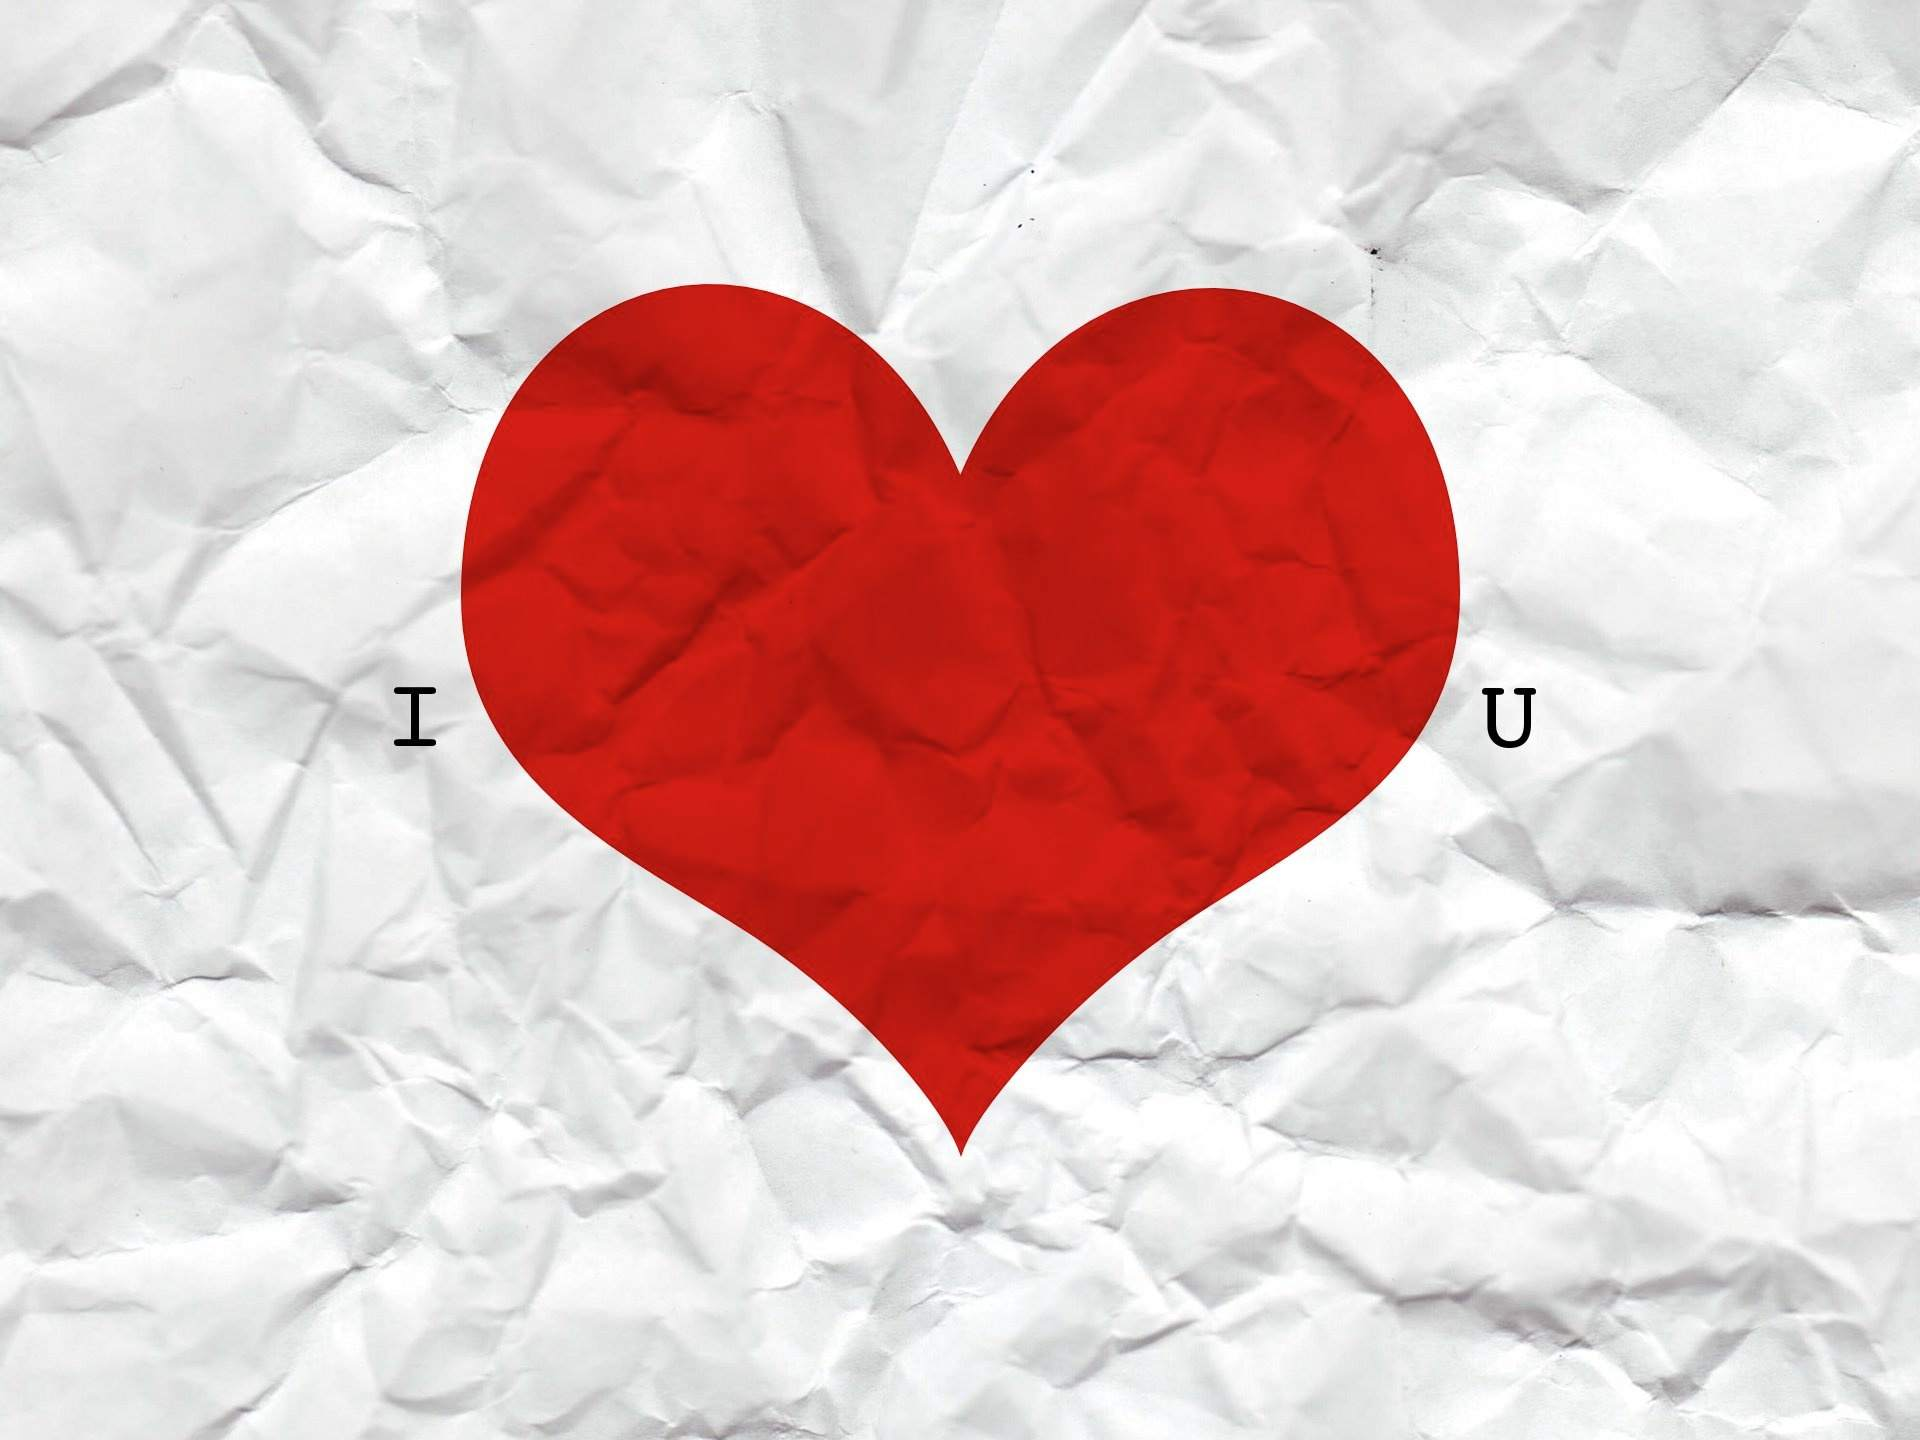 "valentine\u0027s wallpapers top free valentine\u0027s backgrounds1920x1200 freebie release st valentines wallpaper the love birds hongkiat\""\u003e"